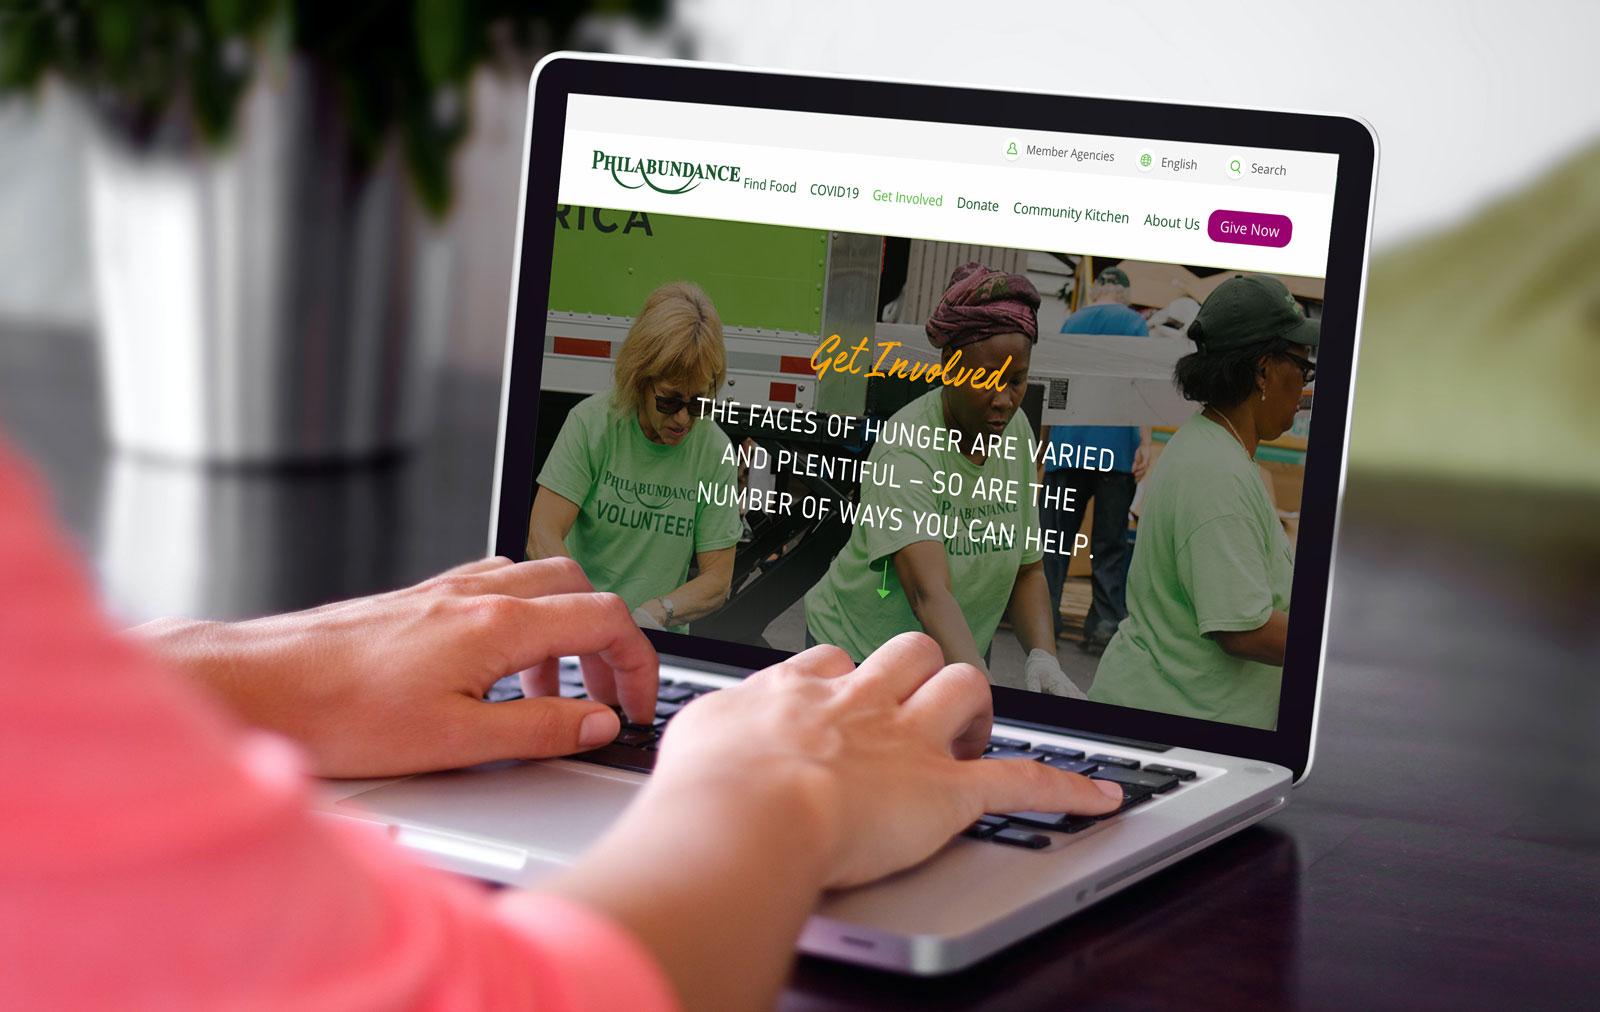 Philabundance Homepage Website Design on Laptop